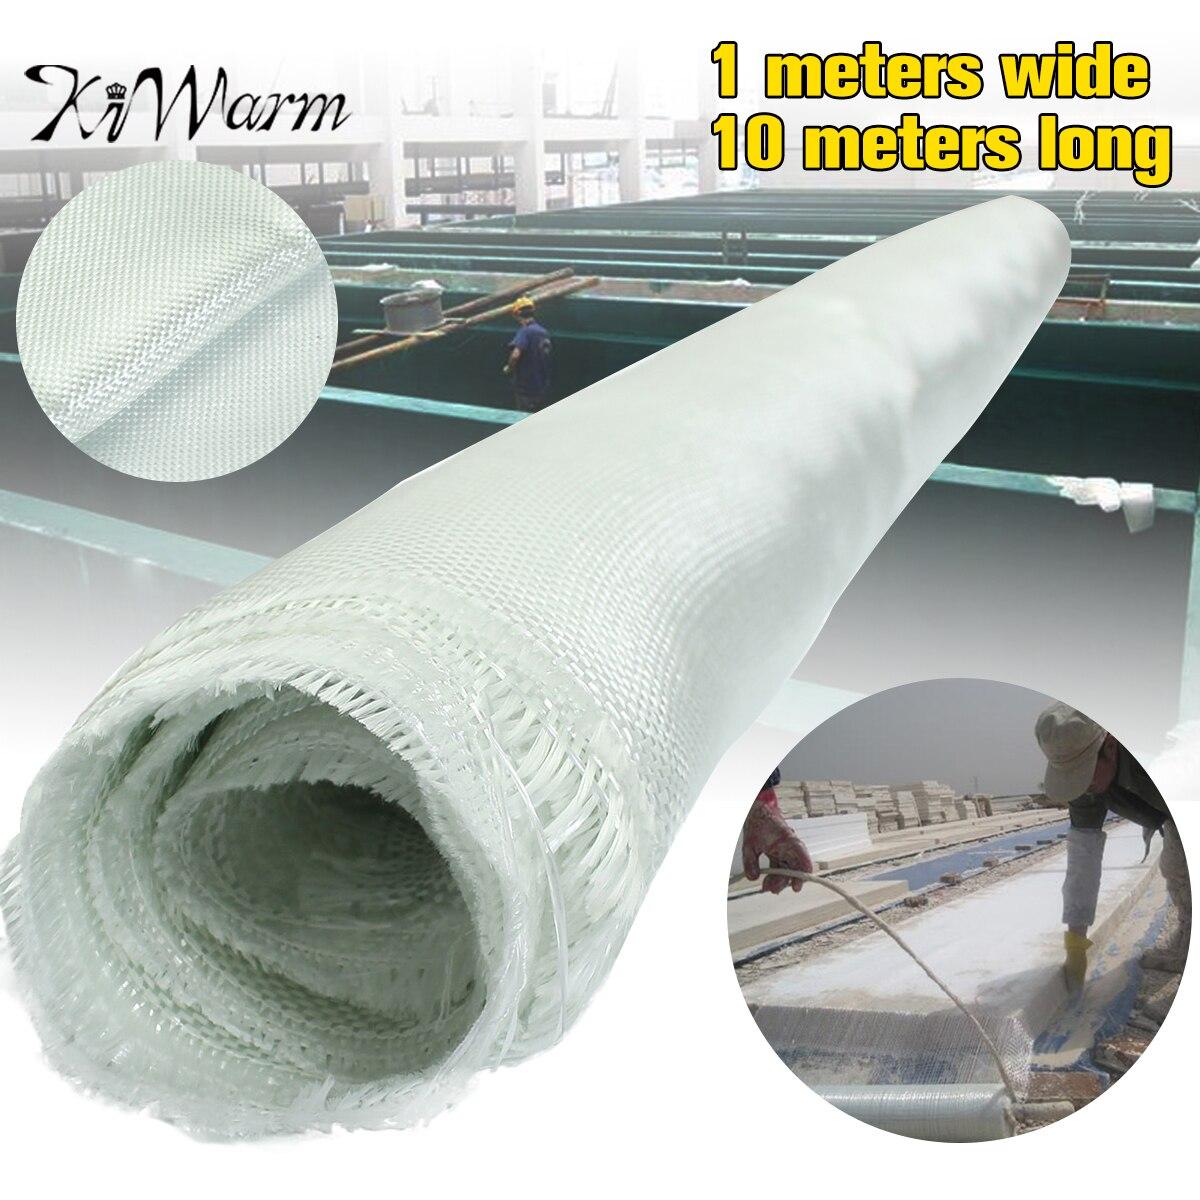 10x1 m tissu en Fiber de verre blanc tissé tissu itinérant en Fiber de verre armure toile Quilting outils bricolage matériel fournitures ignifuge